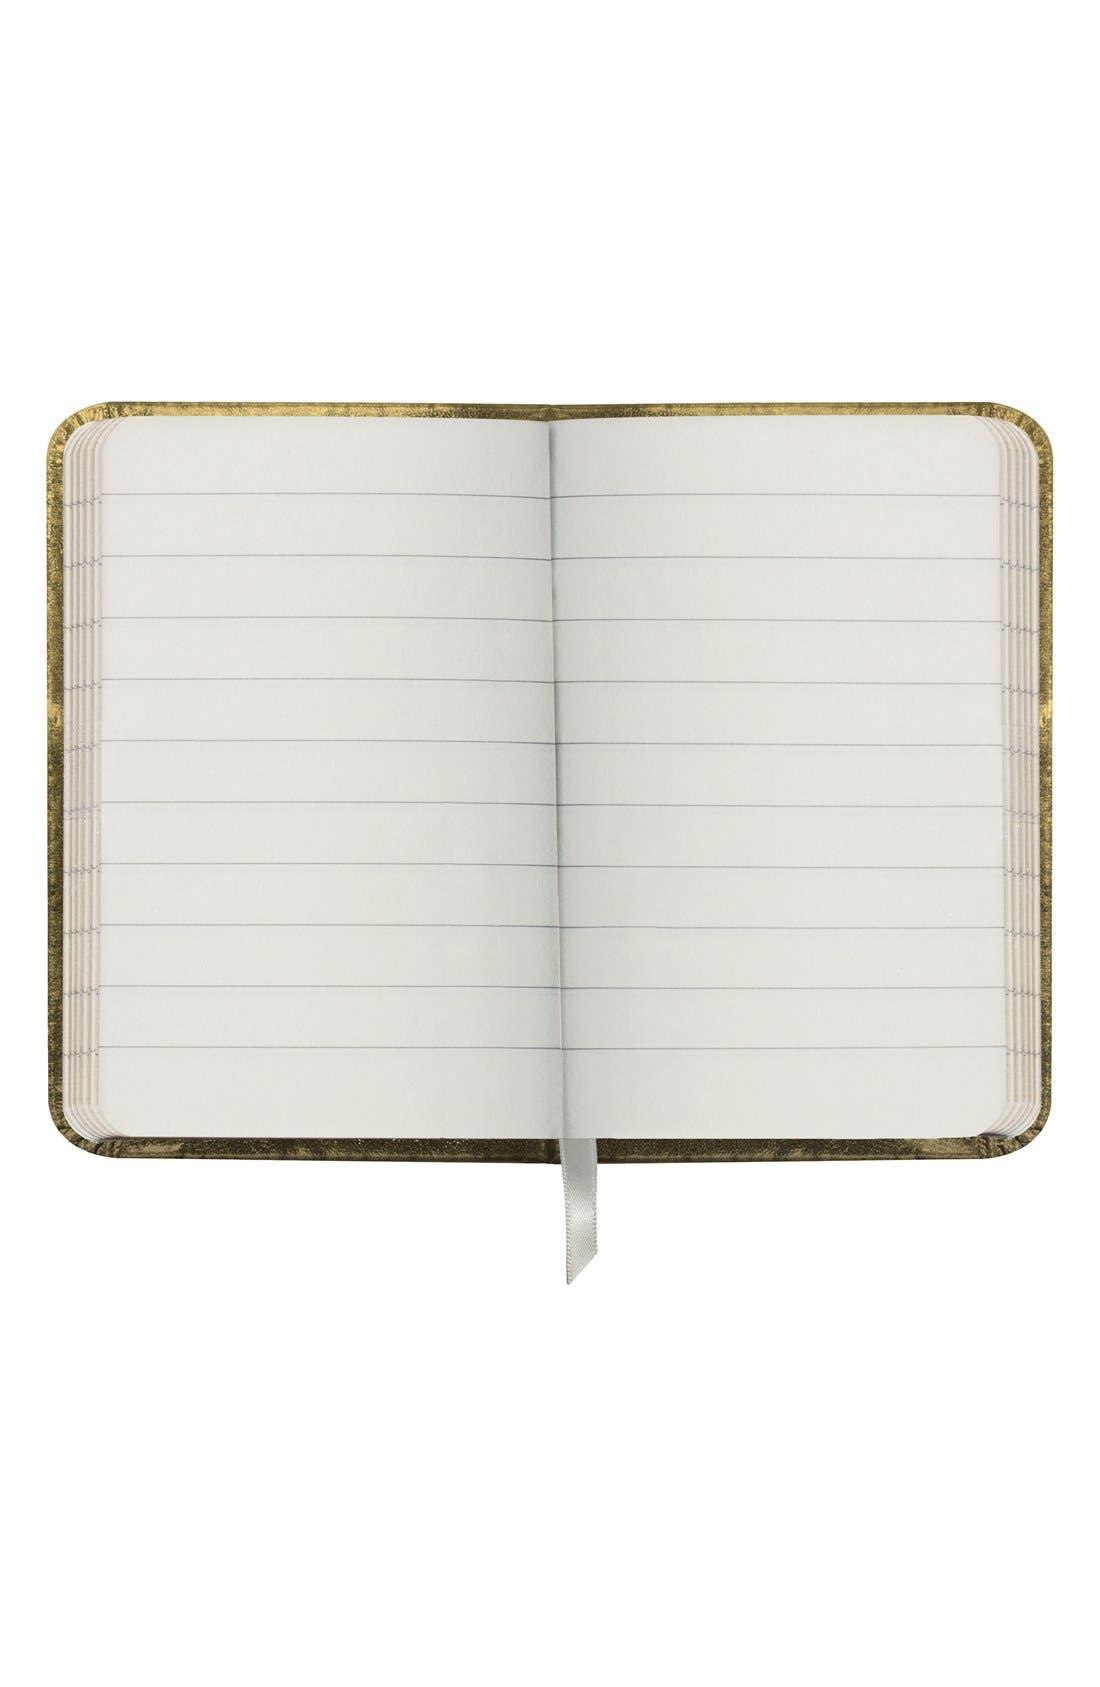 Alternate Image 2  - kate spade new york 'it's written in the stars' mini notebook